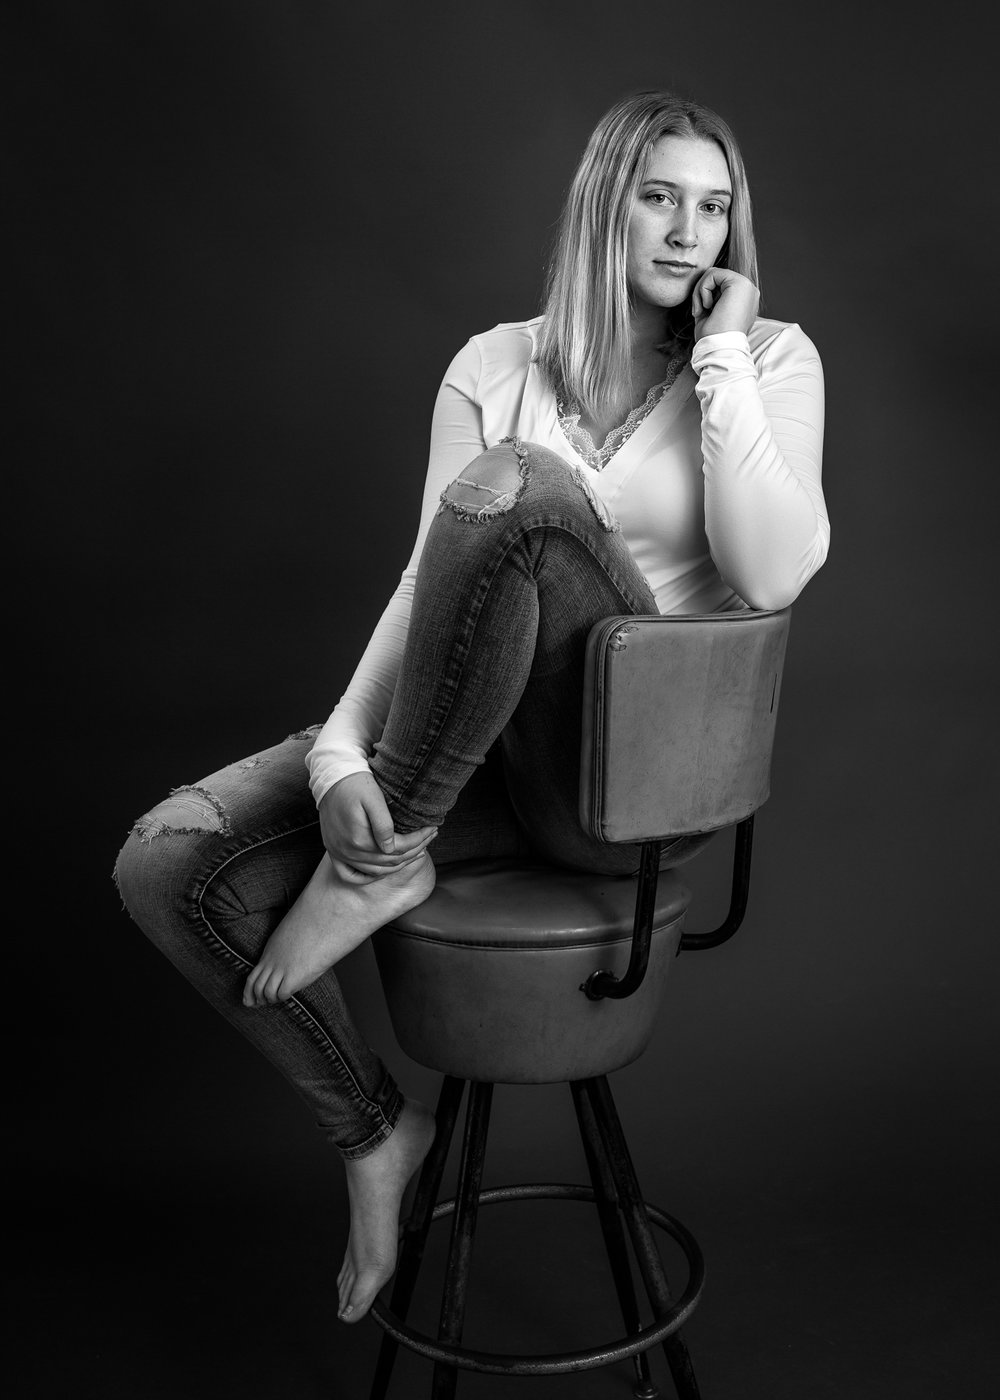 Portage-Michigan-Senior-Teen-Photographer-BEAUTY120818-003.jpg